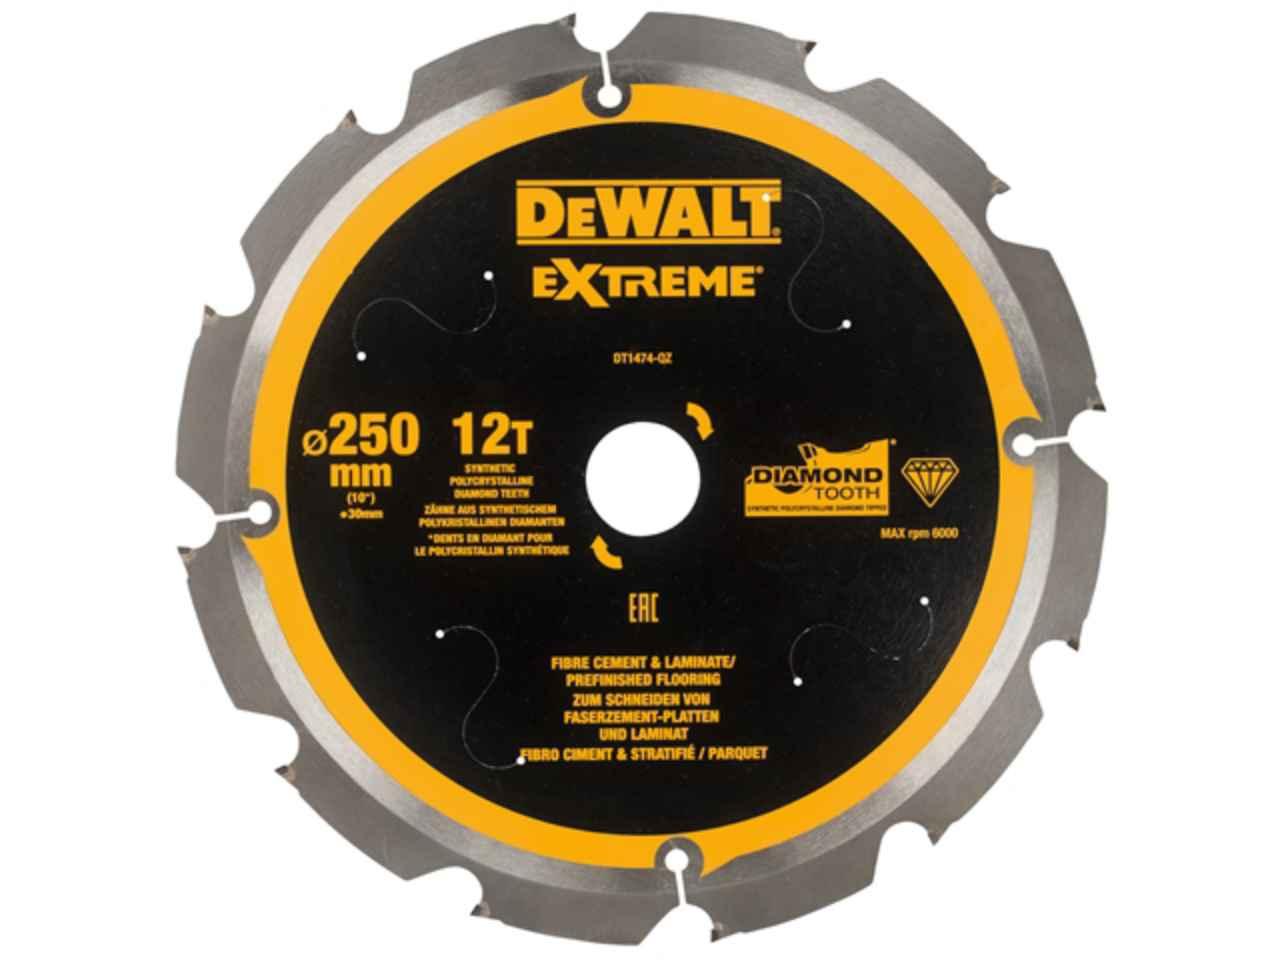 Dewalt Dewdt1474qz Extreme Pcd Fibre Cement Saw Blade 250 X 30mm X 12t